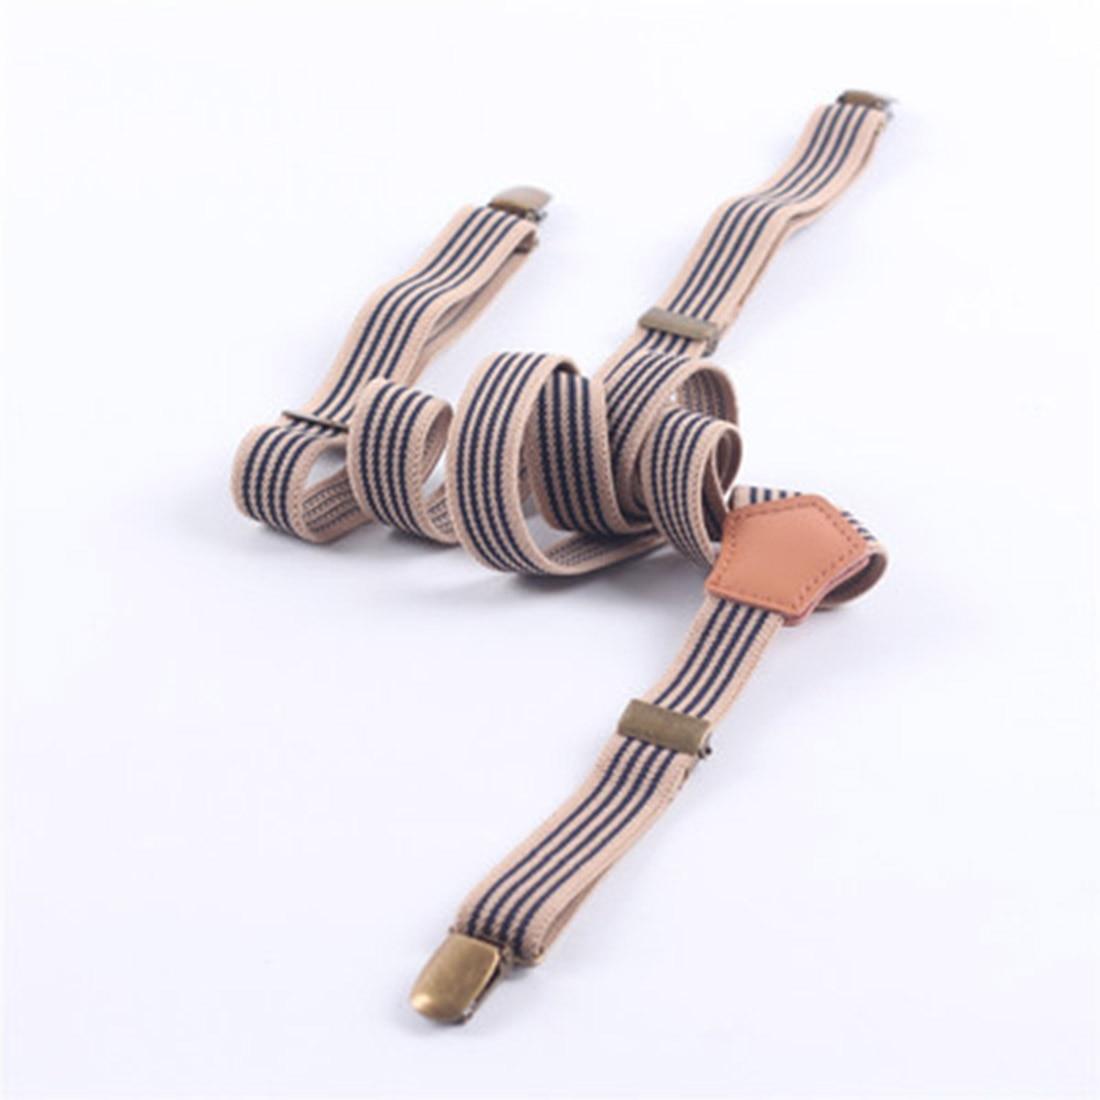 Hot Fashion Jeans Striped Retro 3 Clip Men Women Casual Suspenders Unisex Adjustable Braces